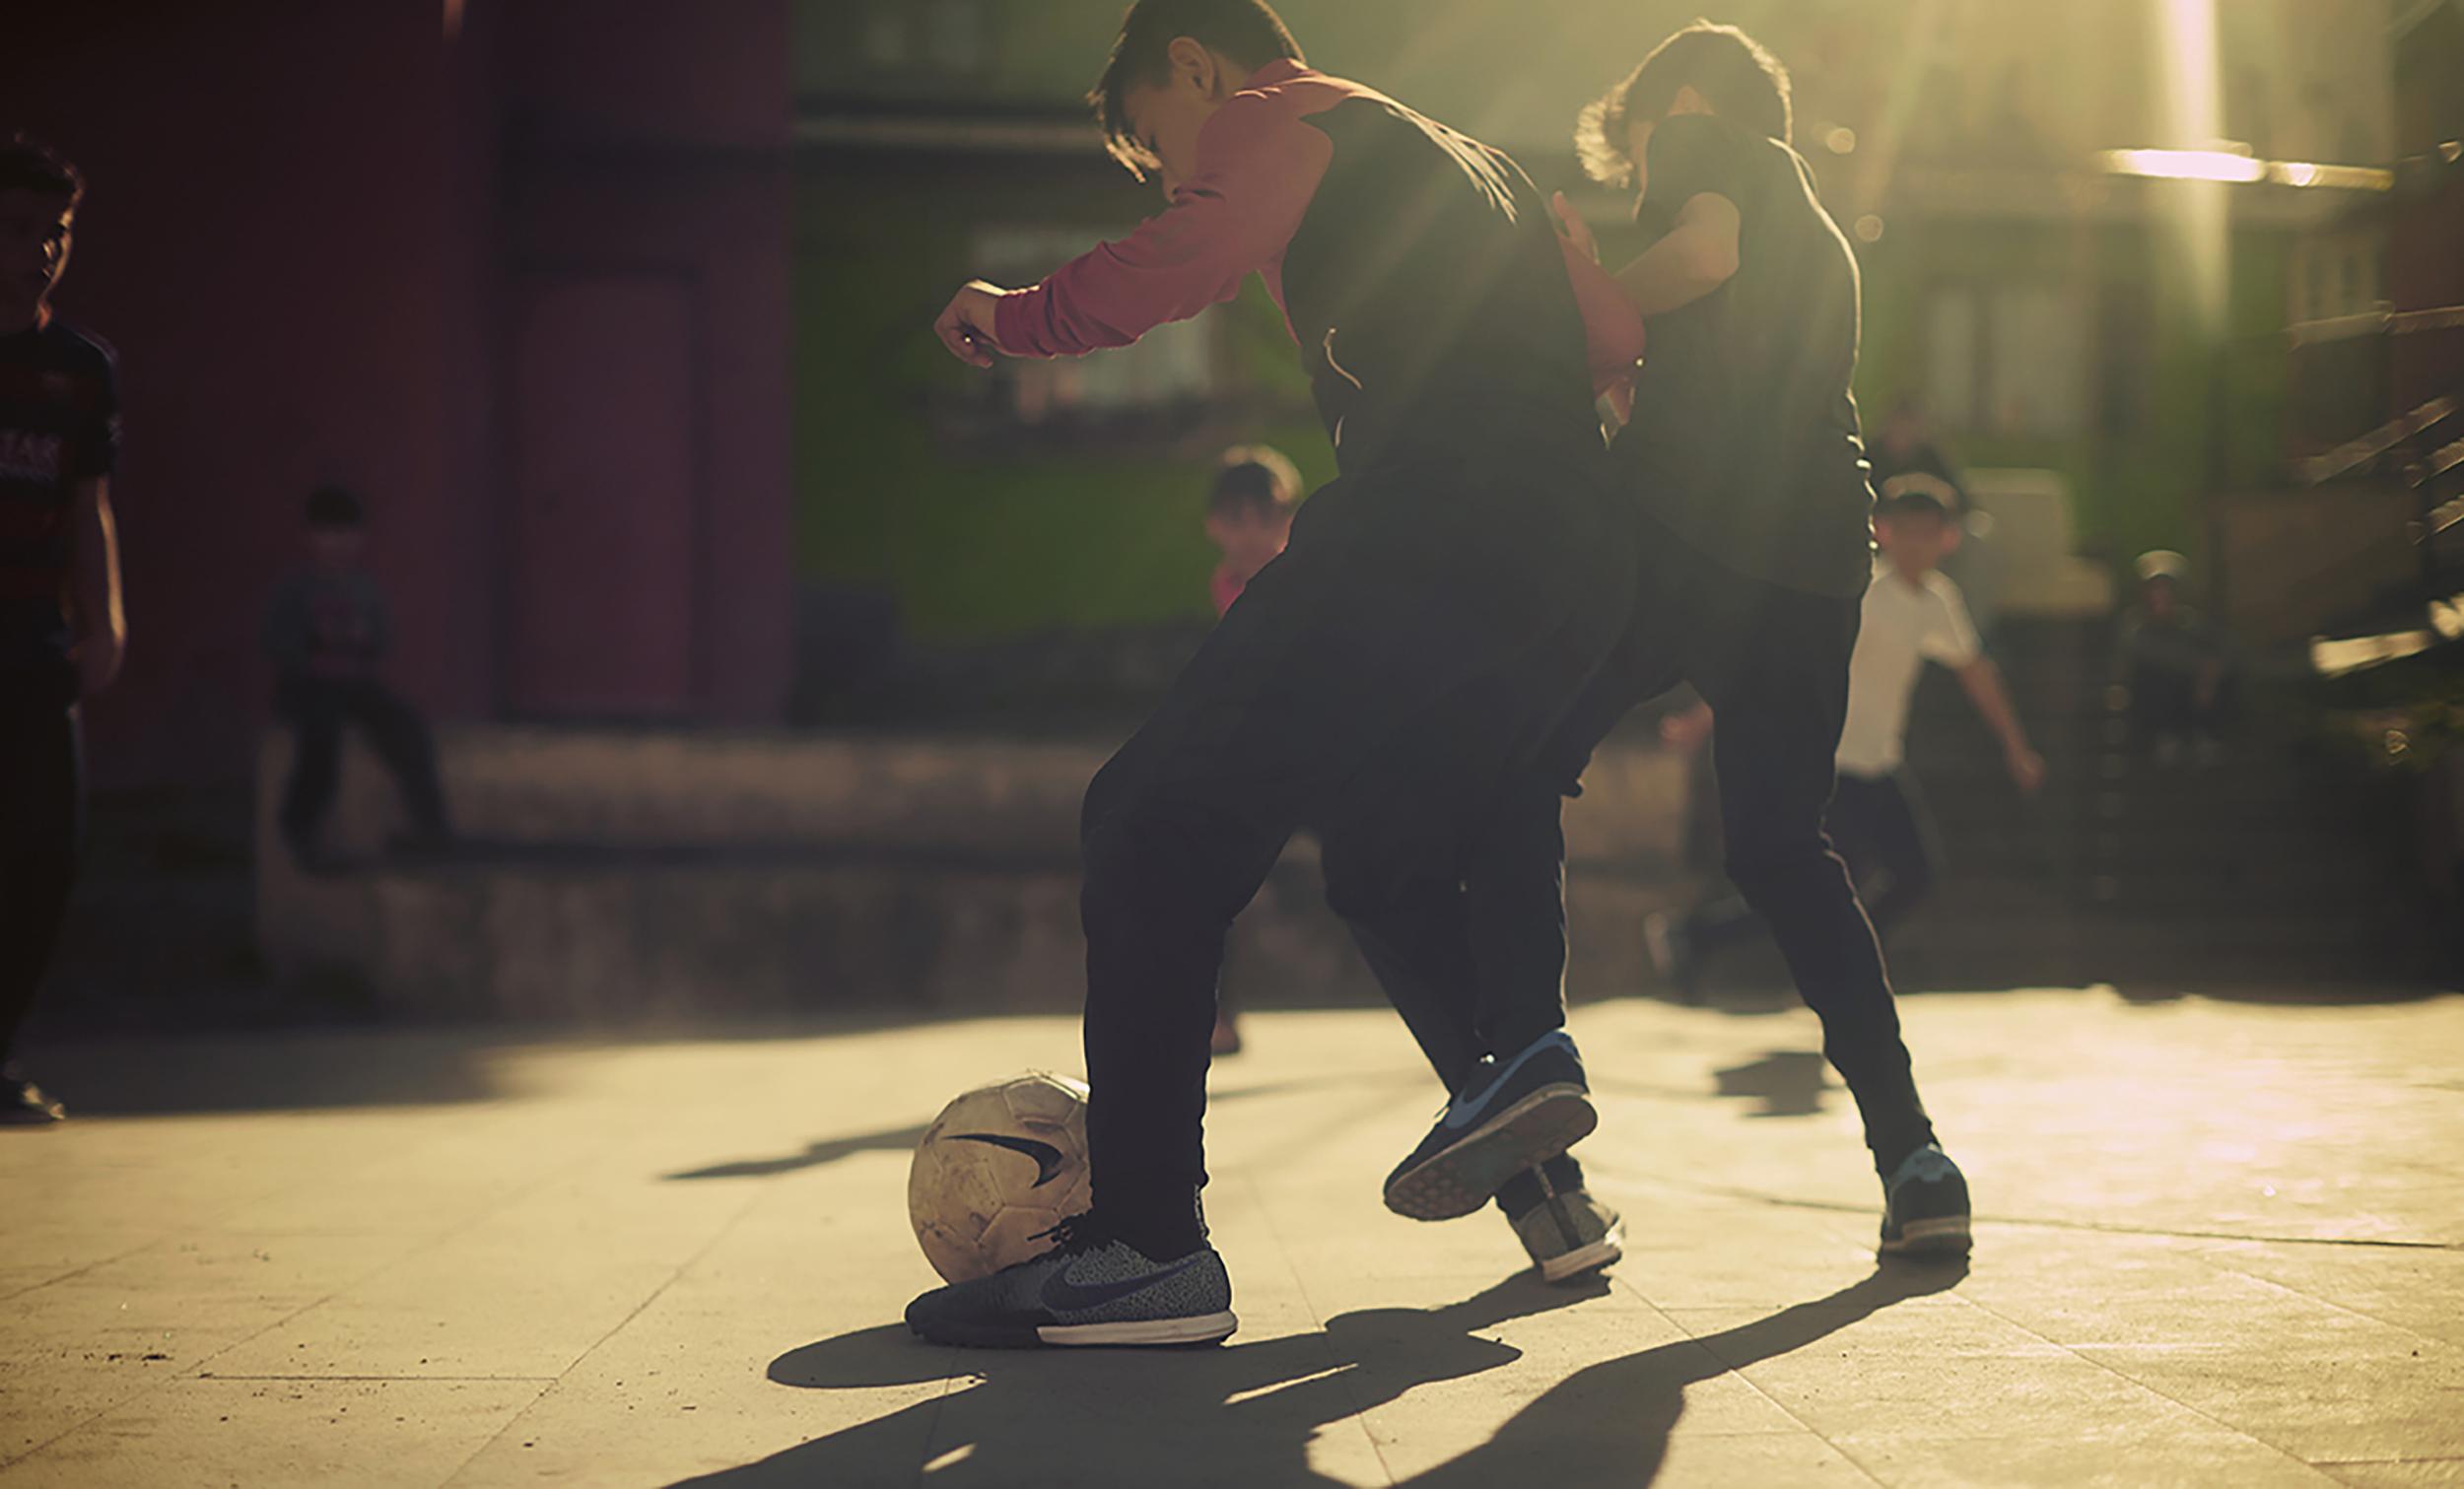 NikeTurkey_TWB_1409.jpg